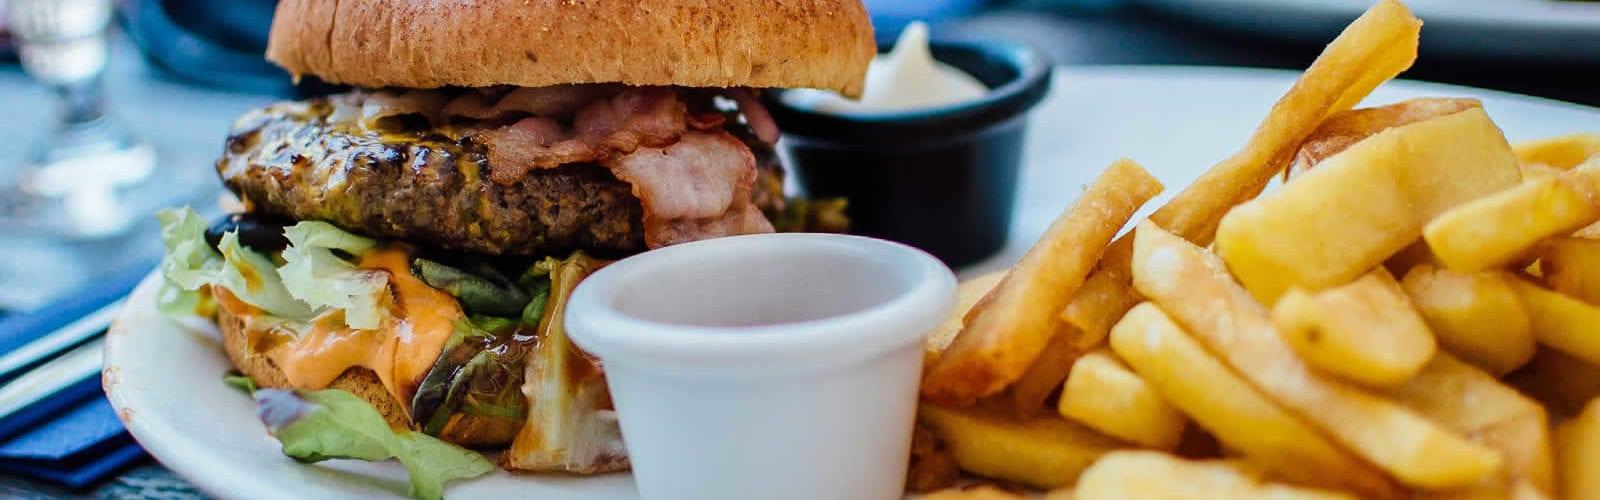 meilleurs-diners-new-york-burger-manger-specialites-sortir-une